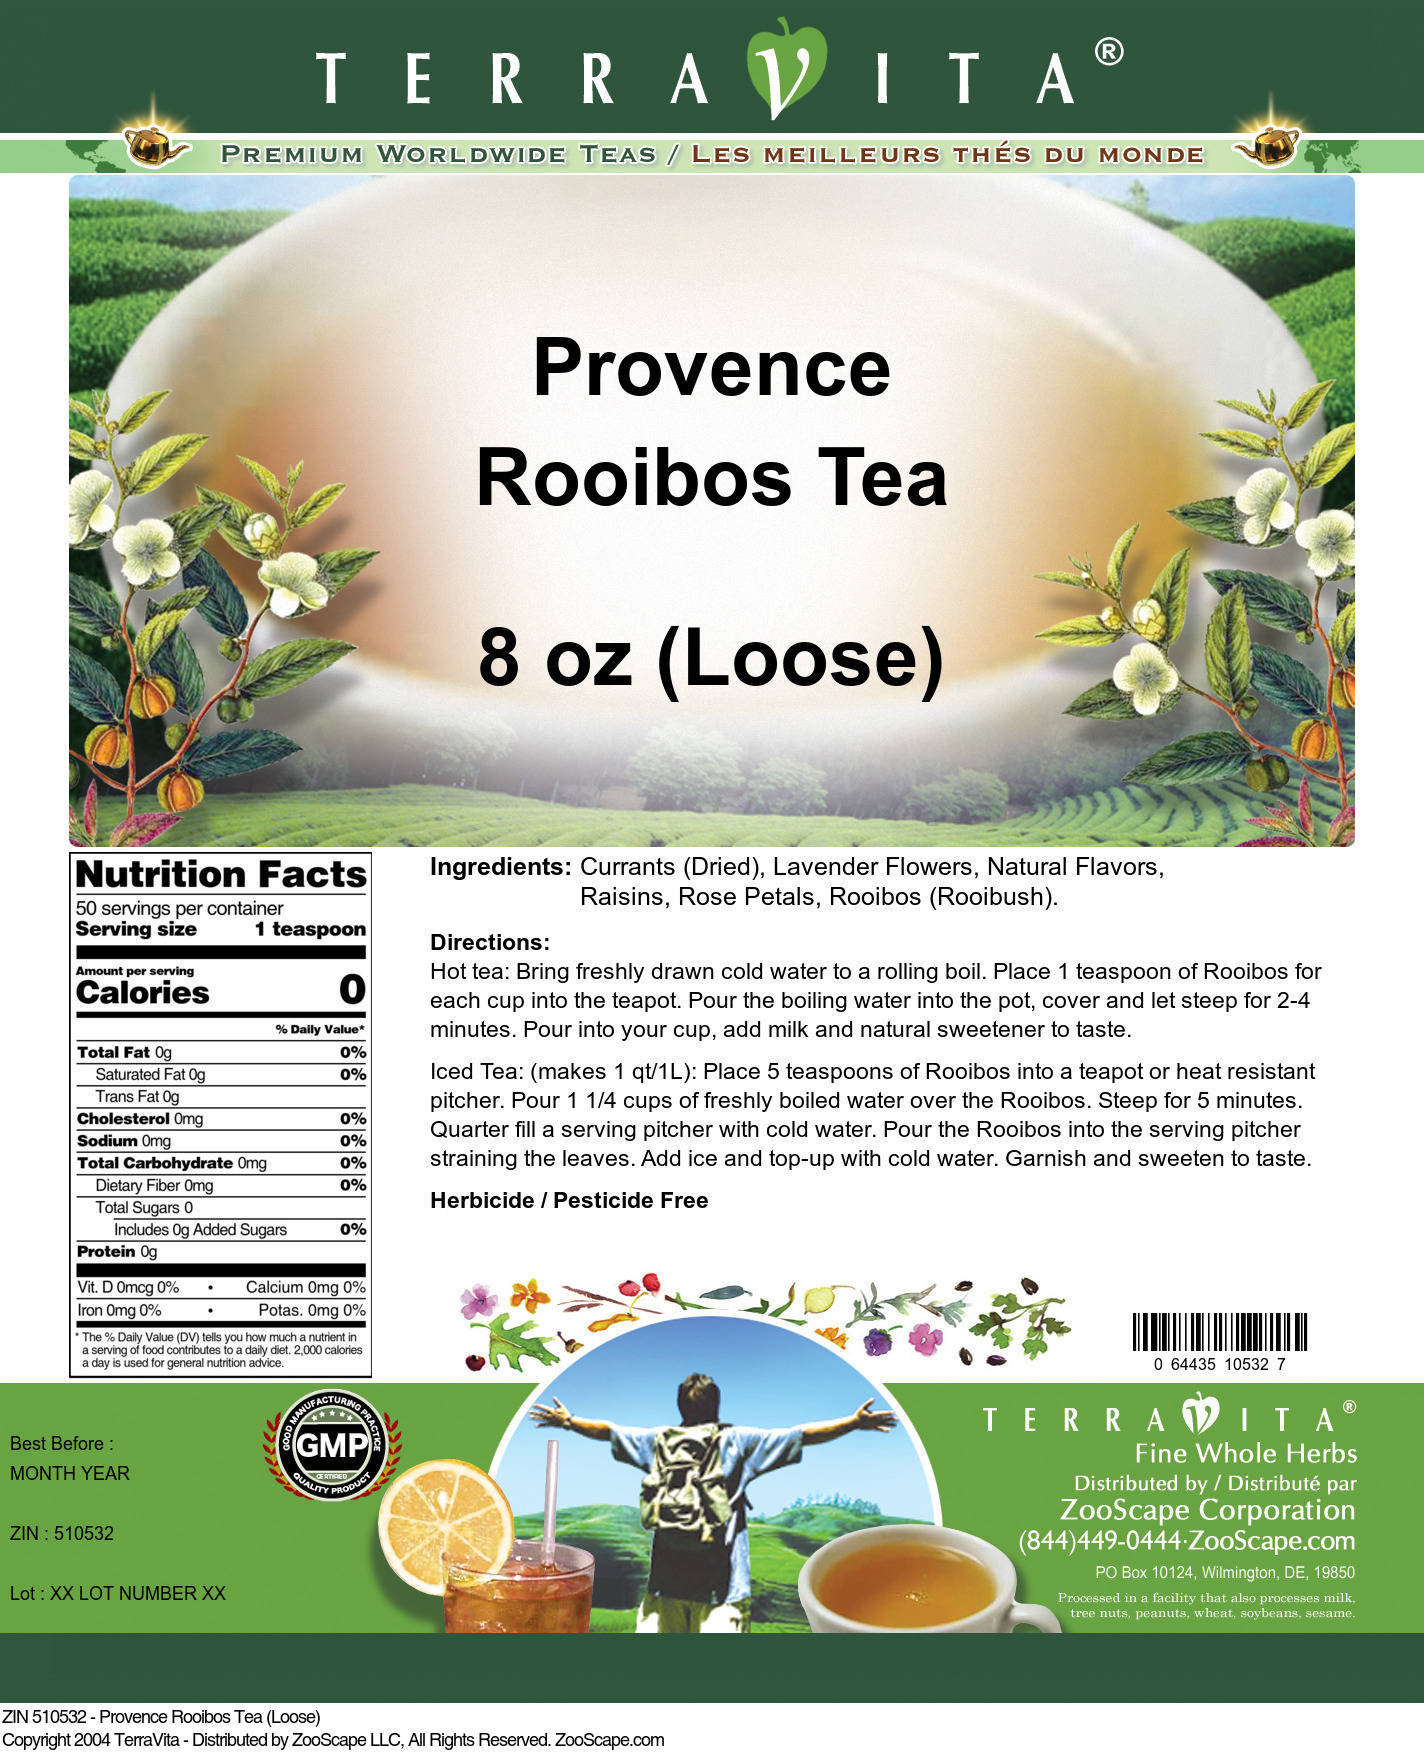 Provence Rooibos Tea (Loose)